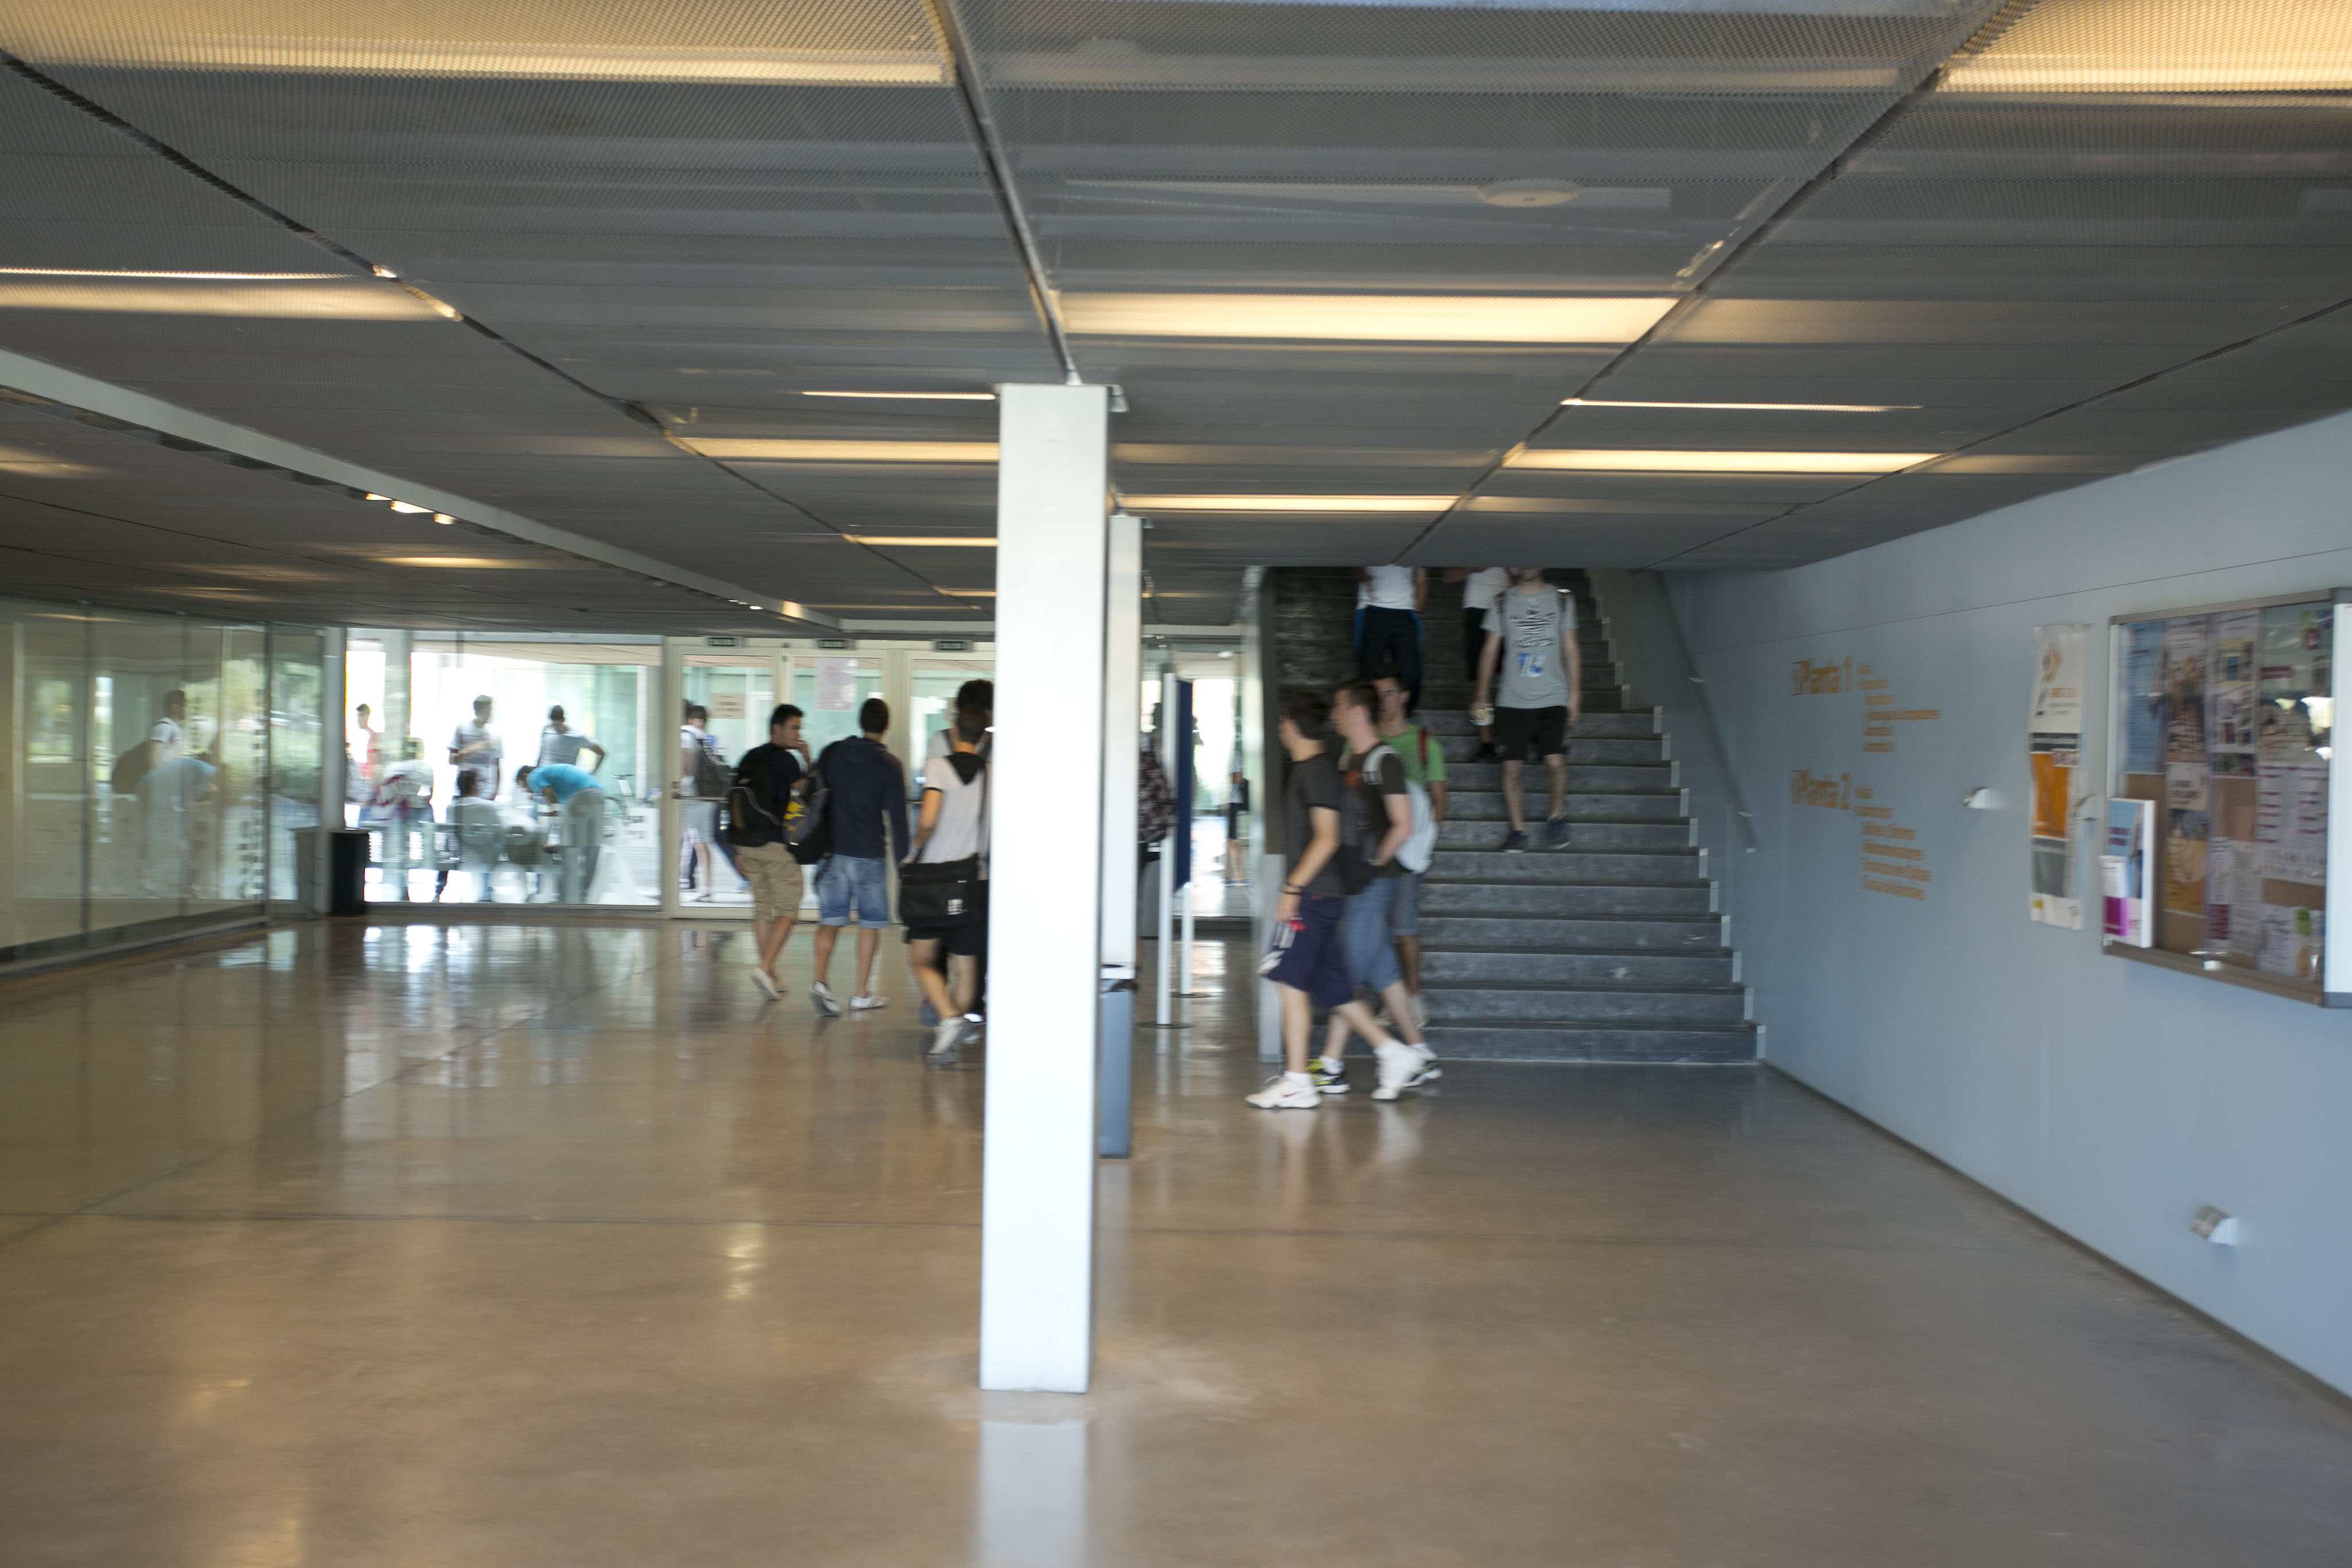 Campus-Elche-exteriores_K8B2200